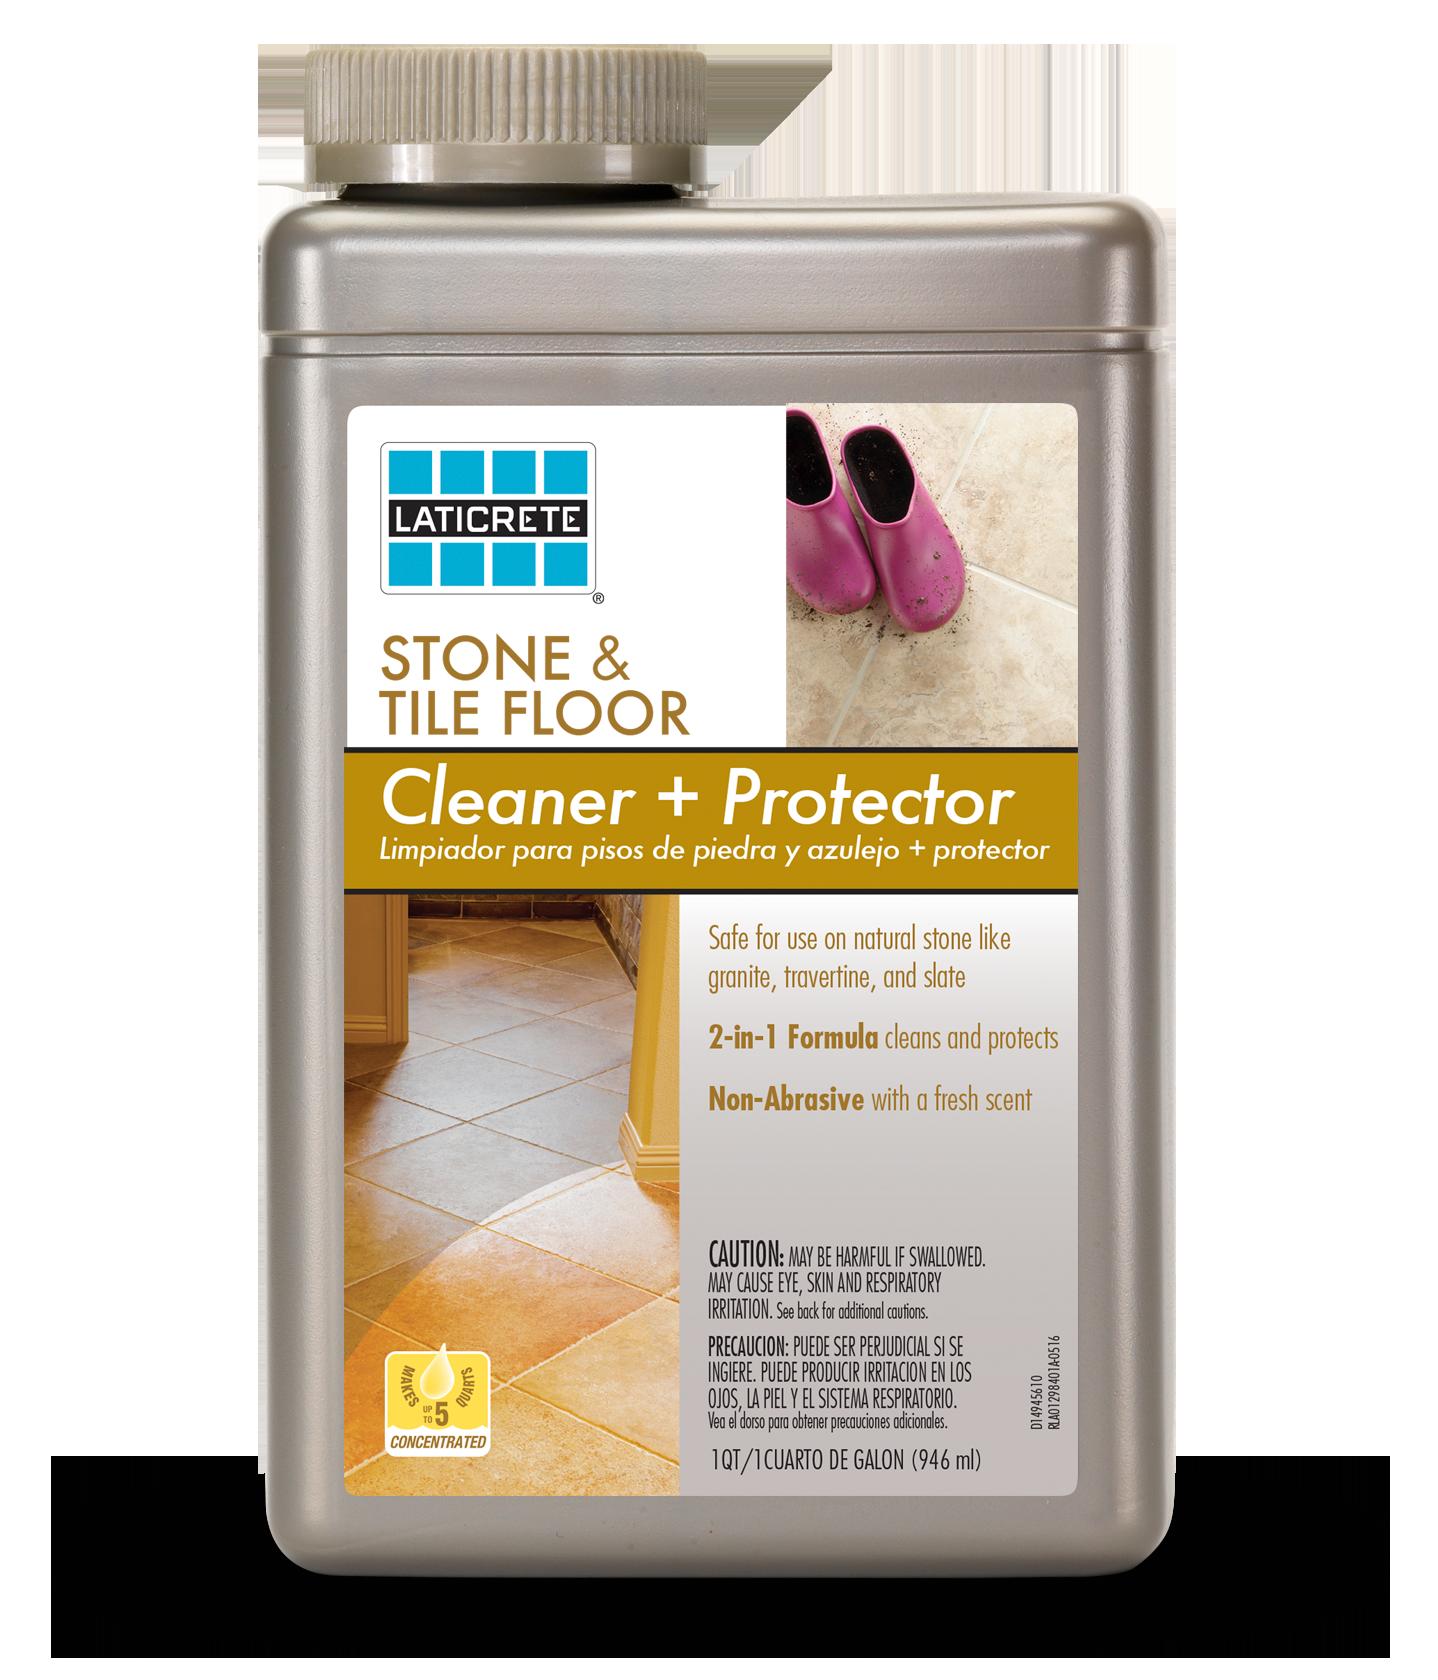 LATICRETE® Stone & Tile Floor Cleaner & Protector